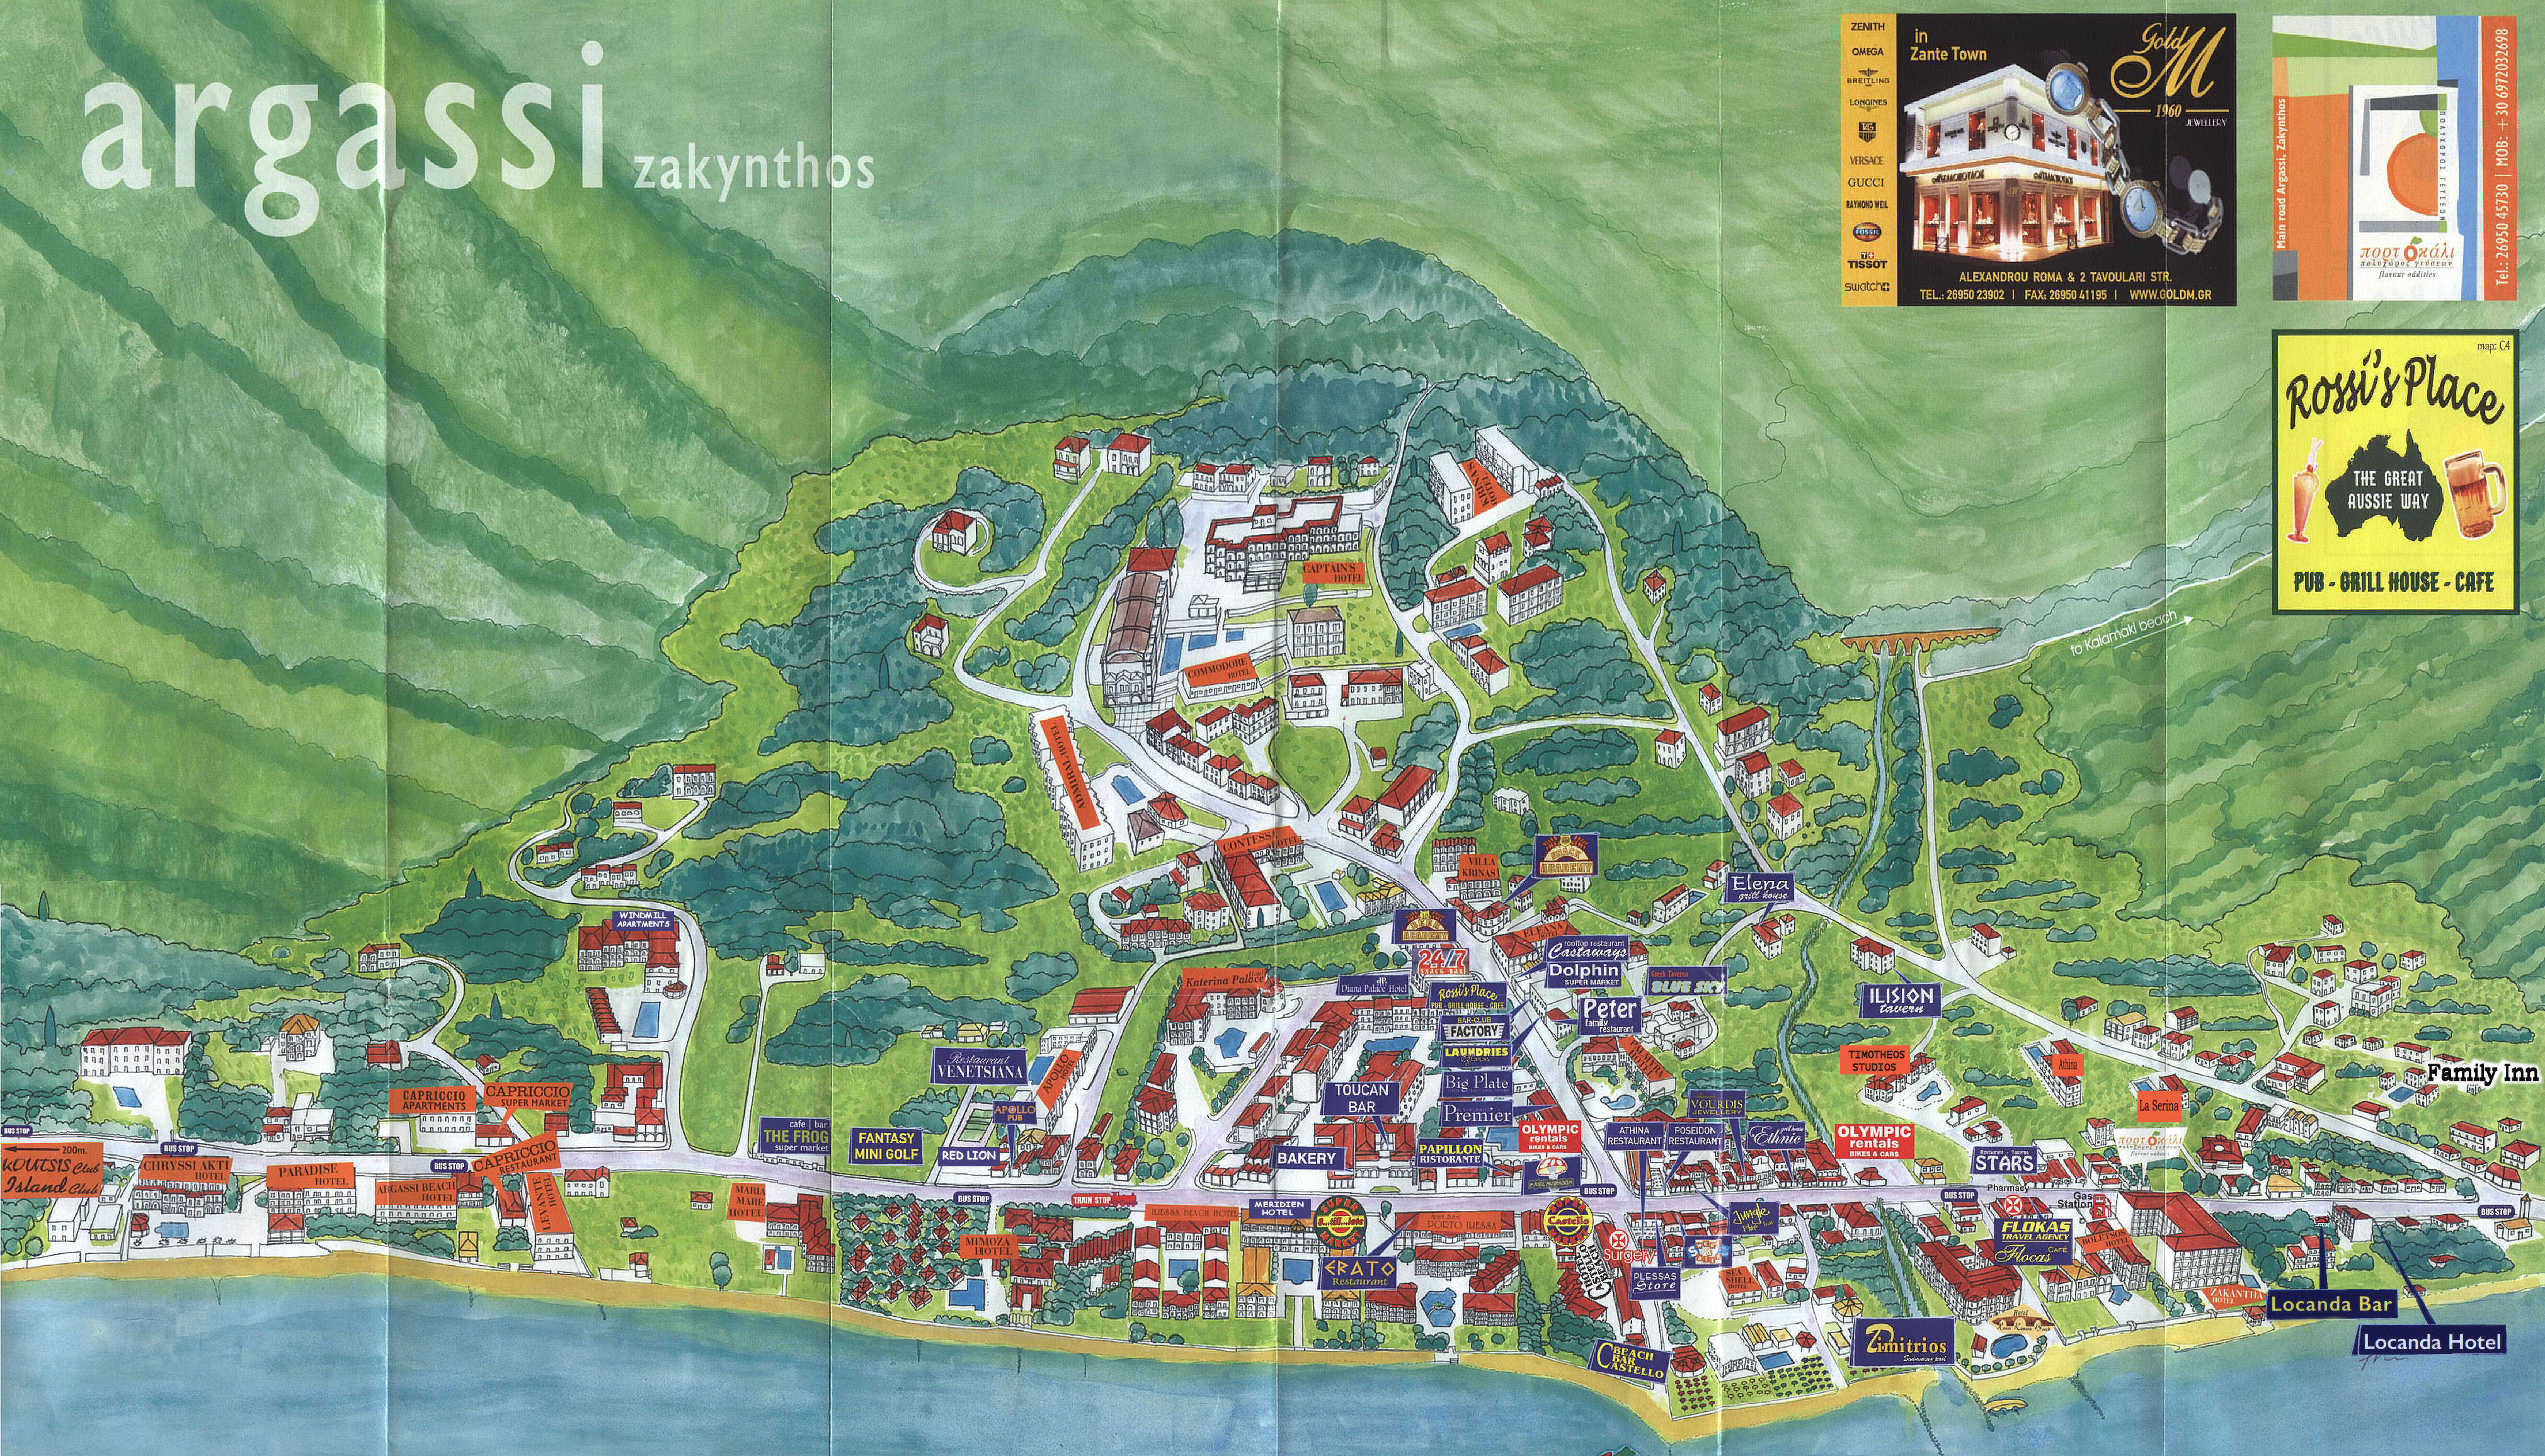 Argassi tourist map argassi zakynthos greece mappery gumiabroncs Choice Image